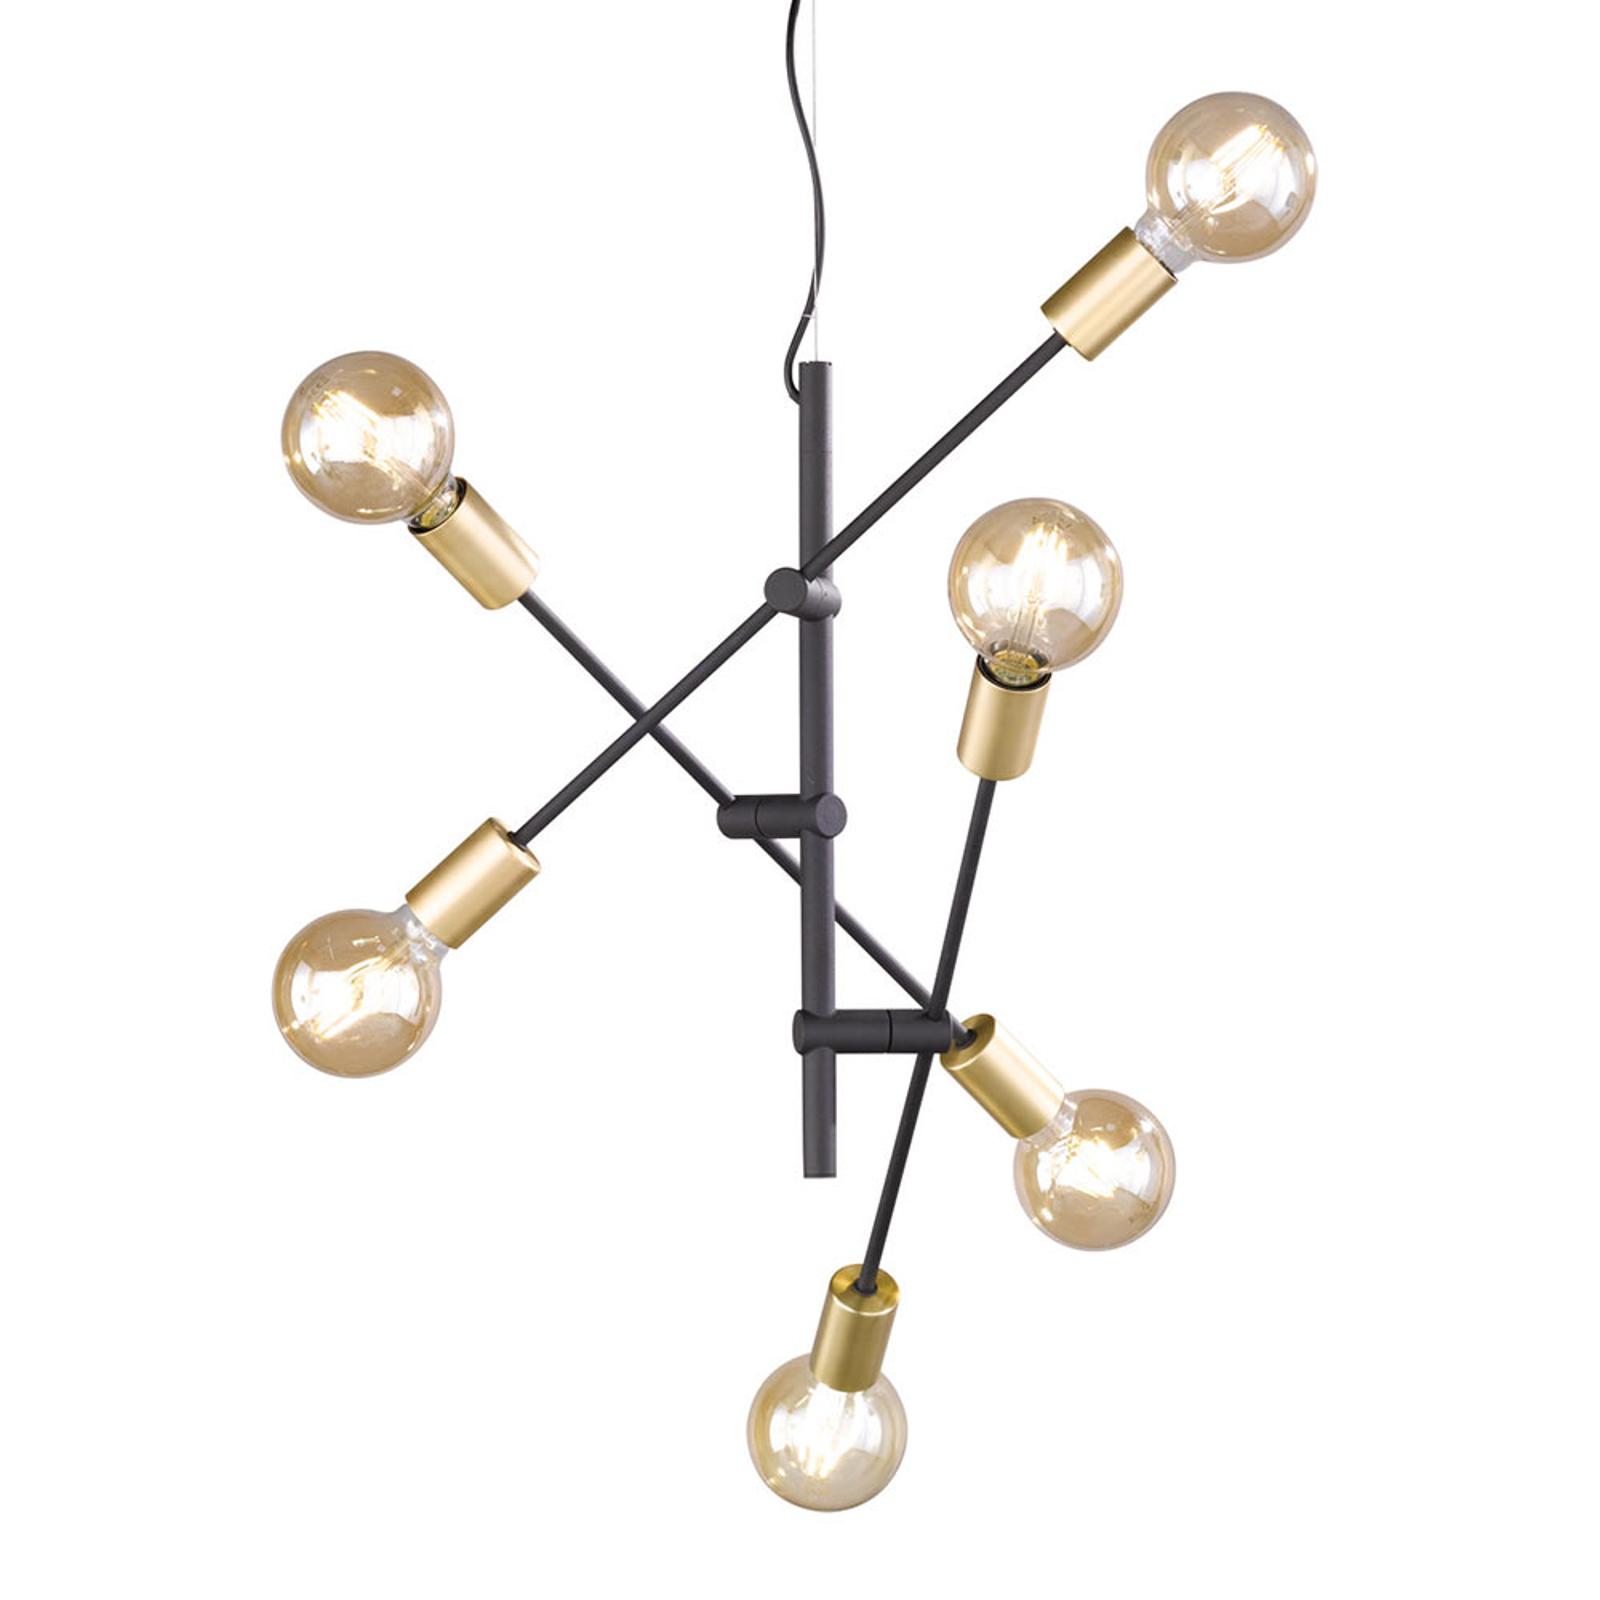 Minimalistisk designet pendellampe Cross